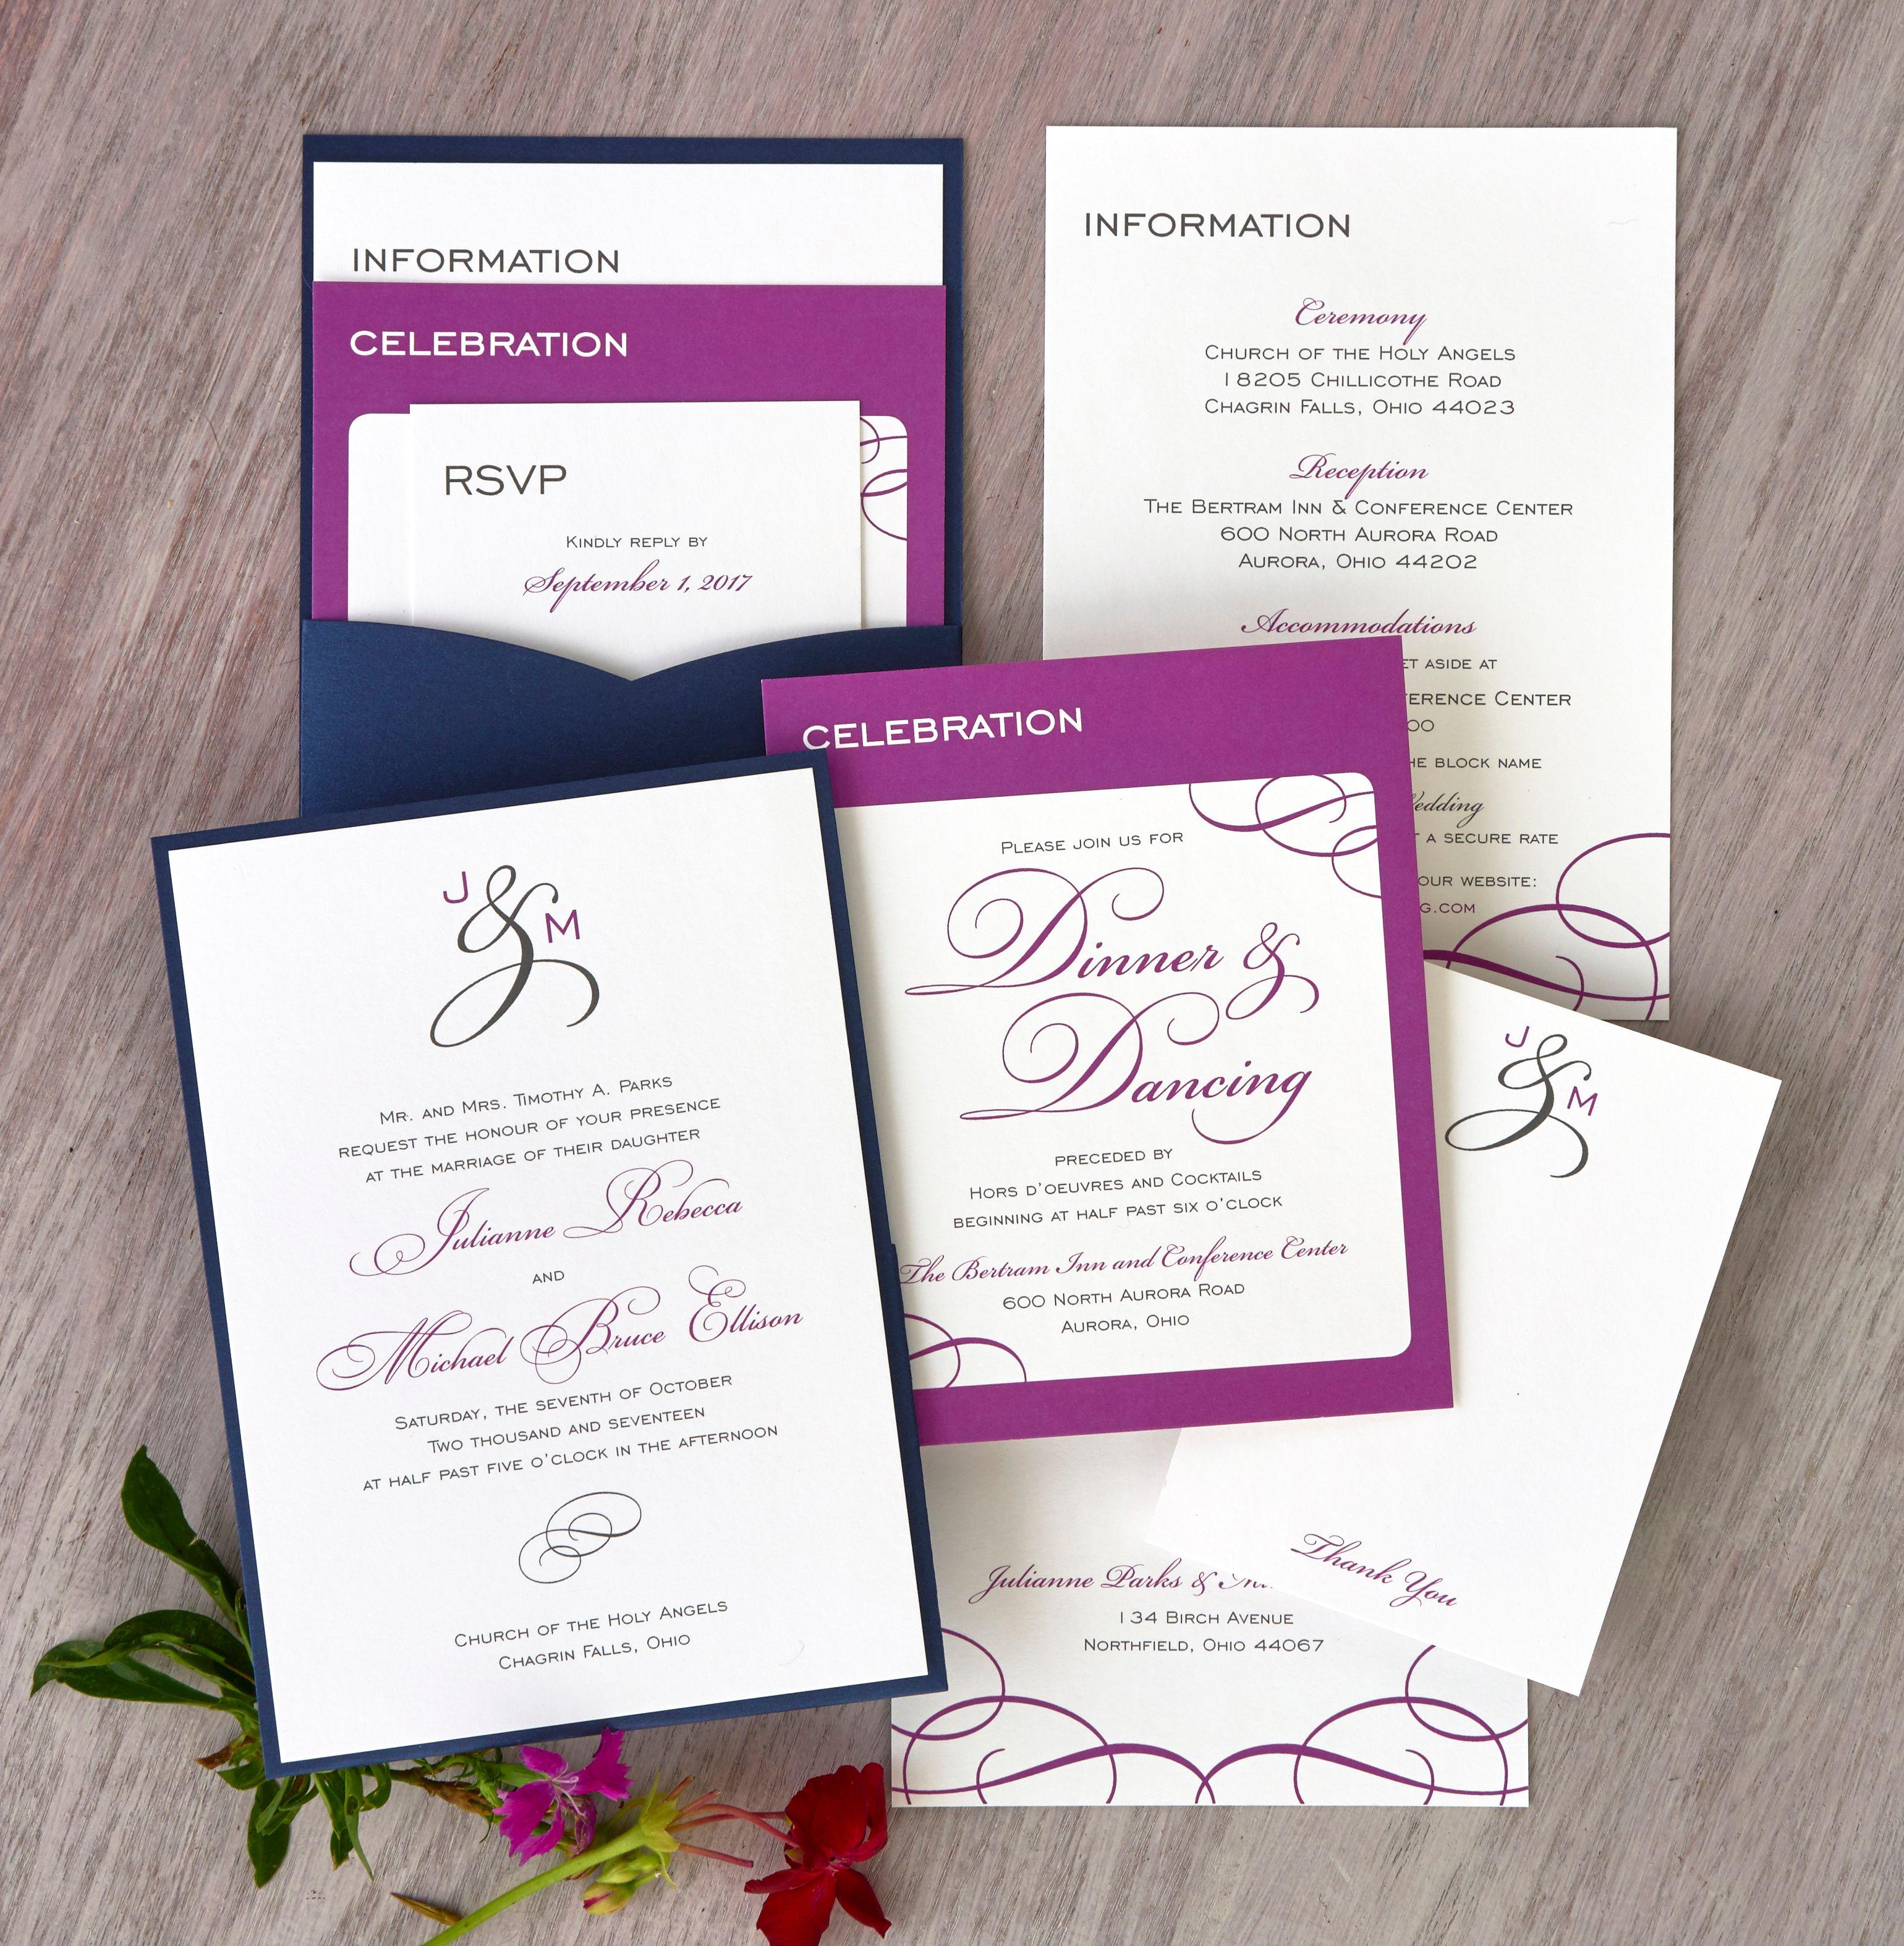 Clutch wedding invitaitons weddinginspired weddinginvitations